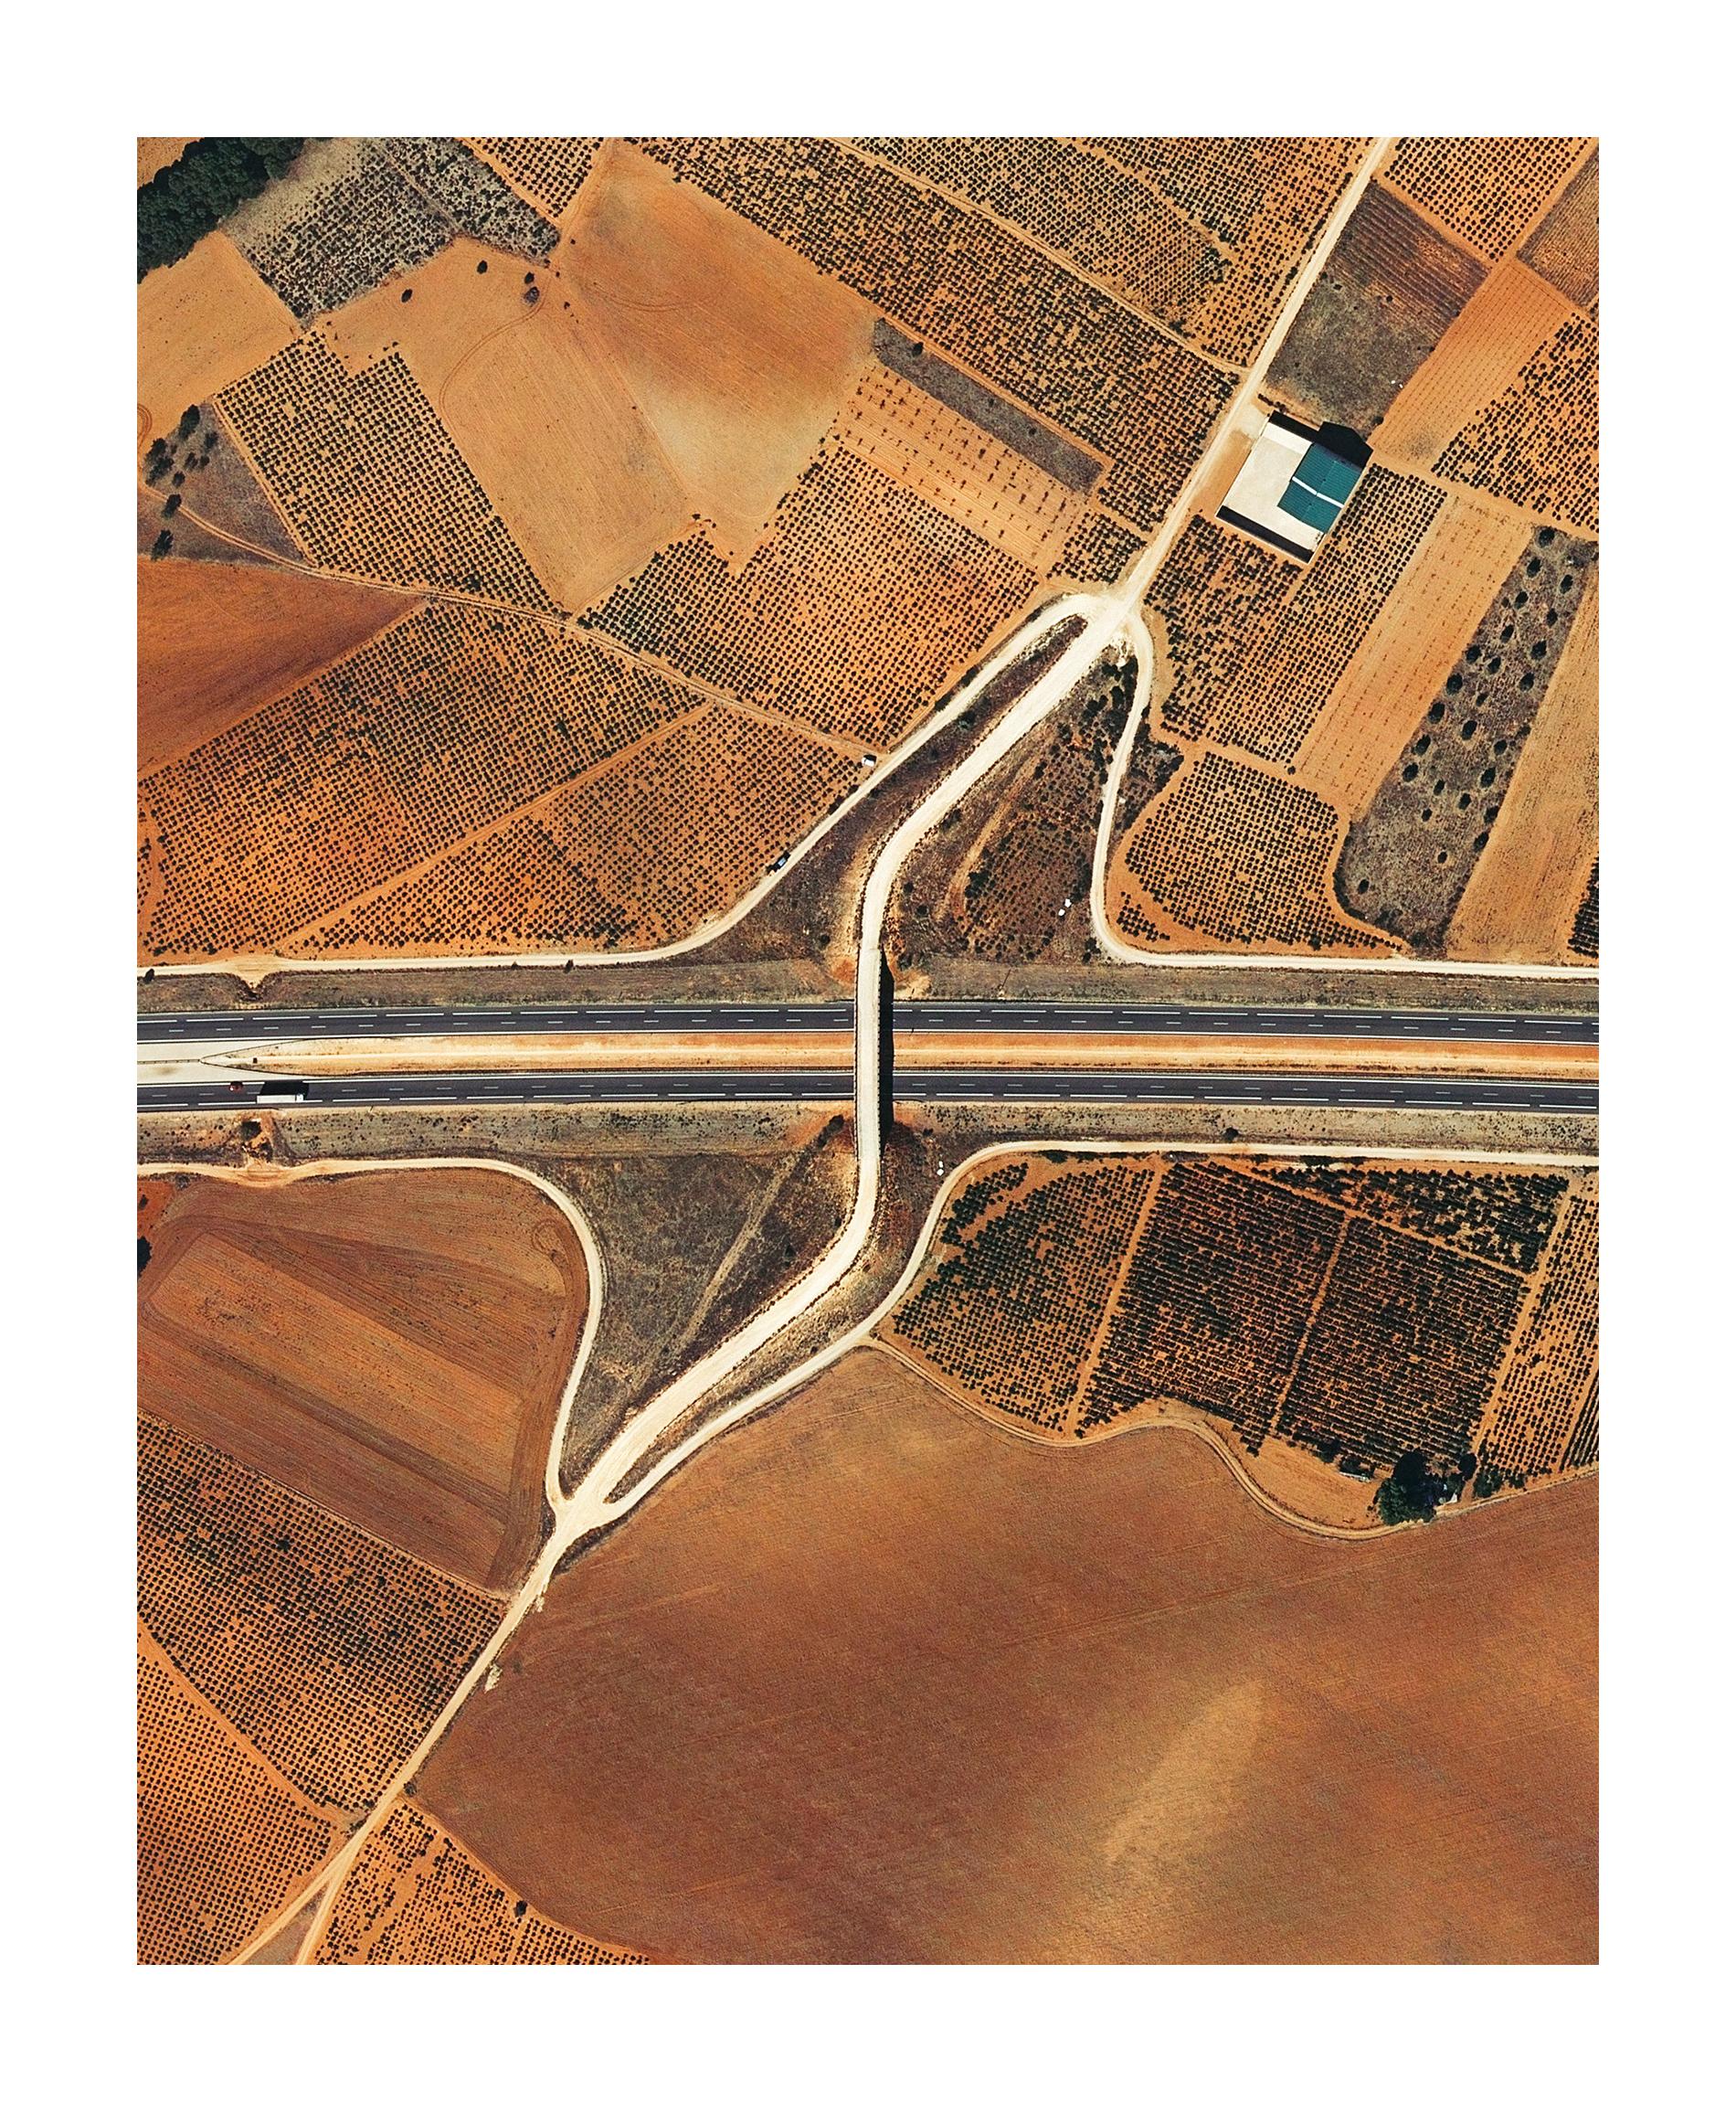 Highway Semiotics I